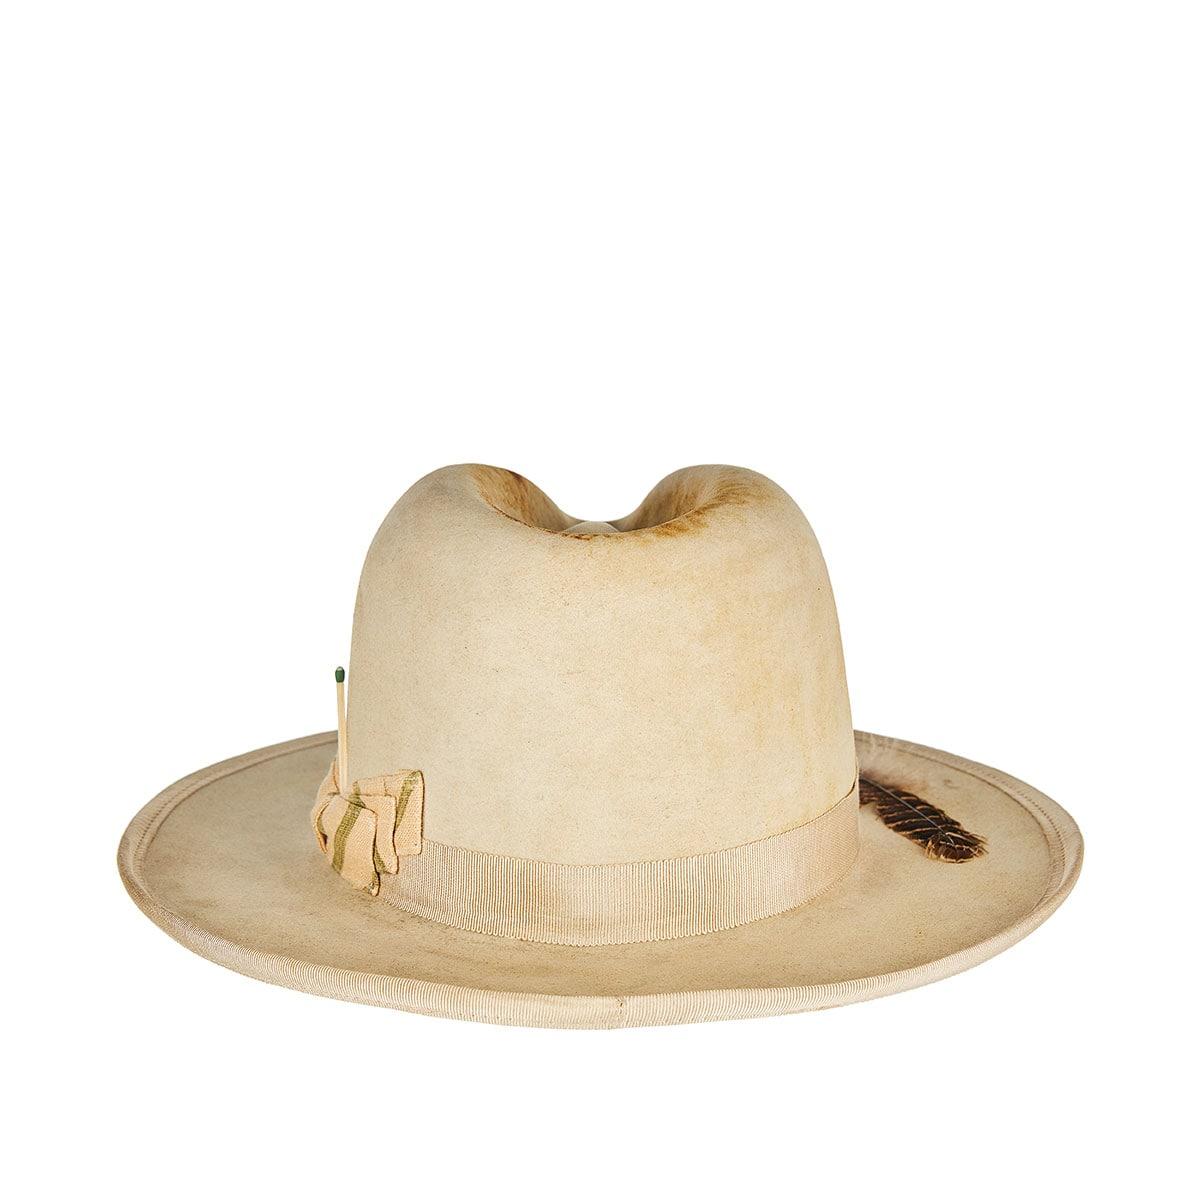 San Miguel distressed felt hat